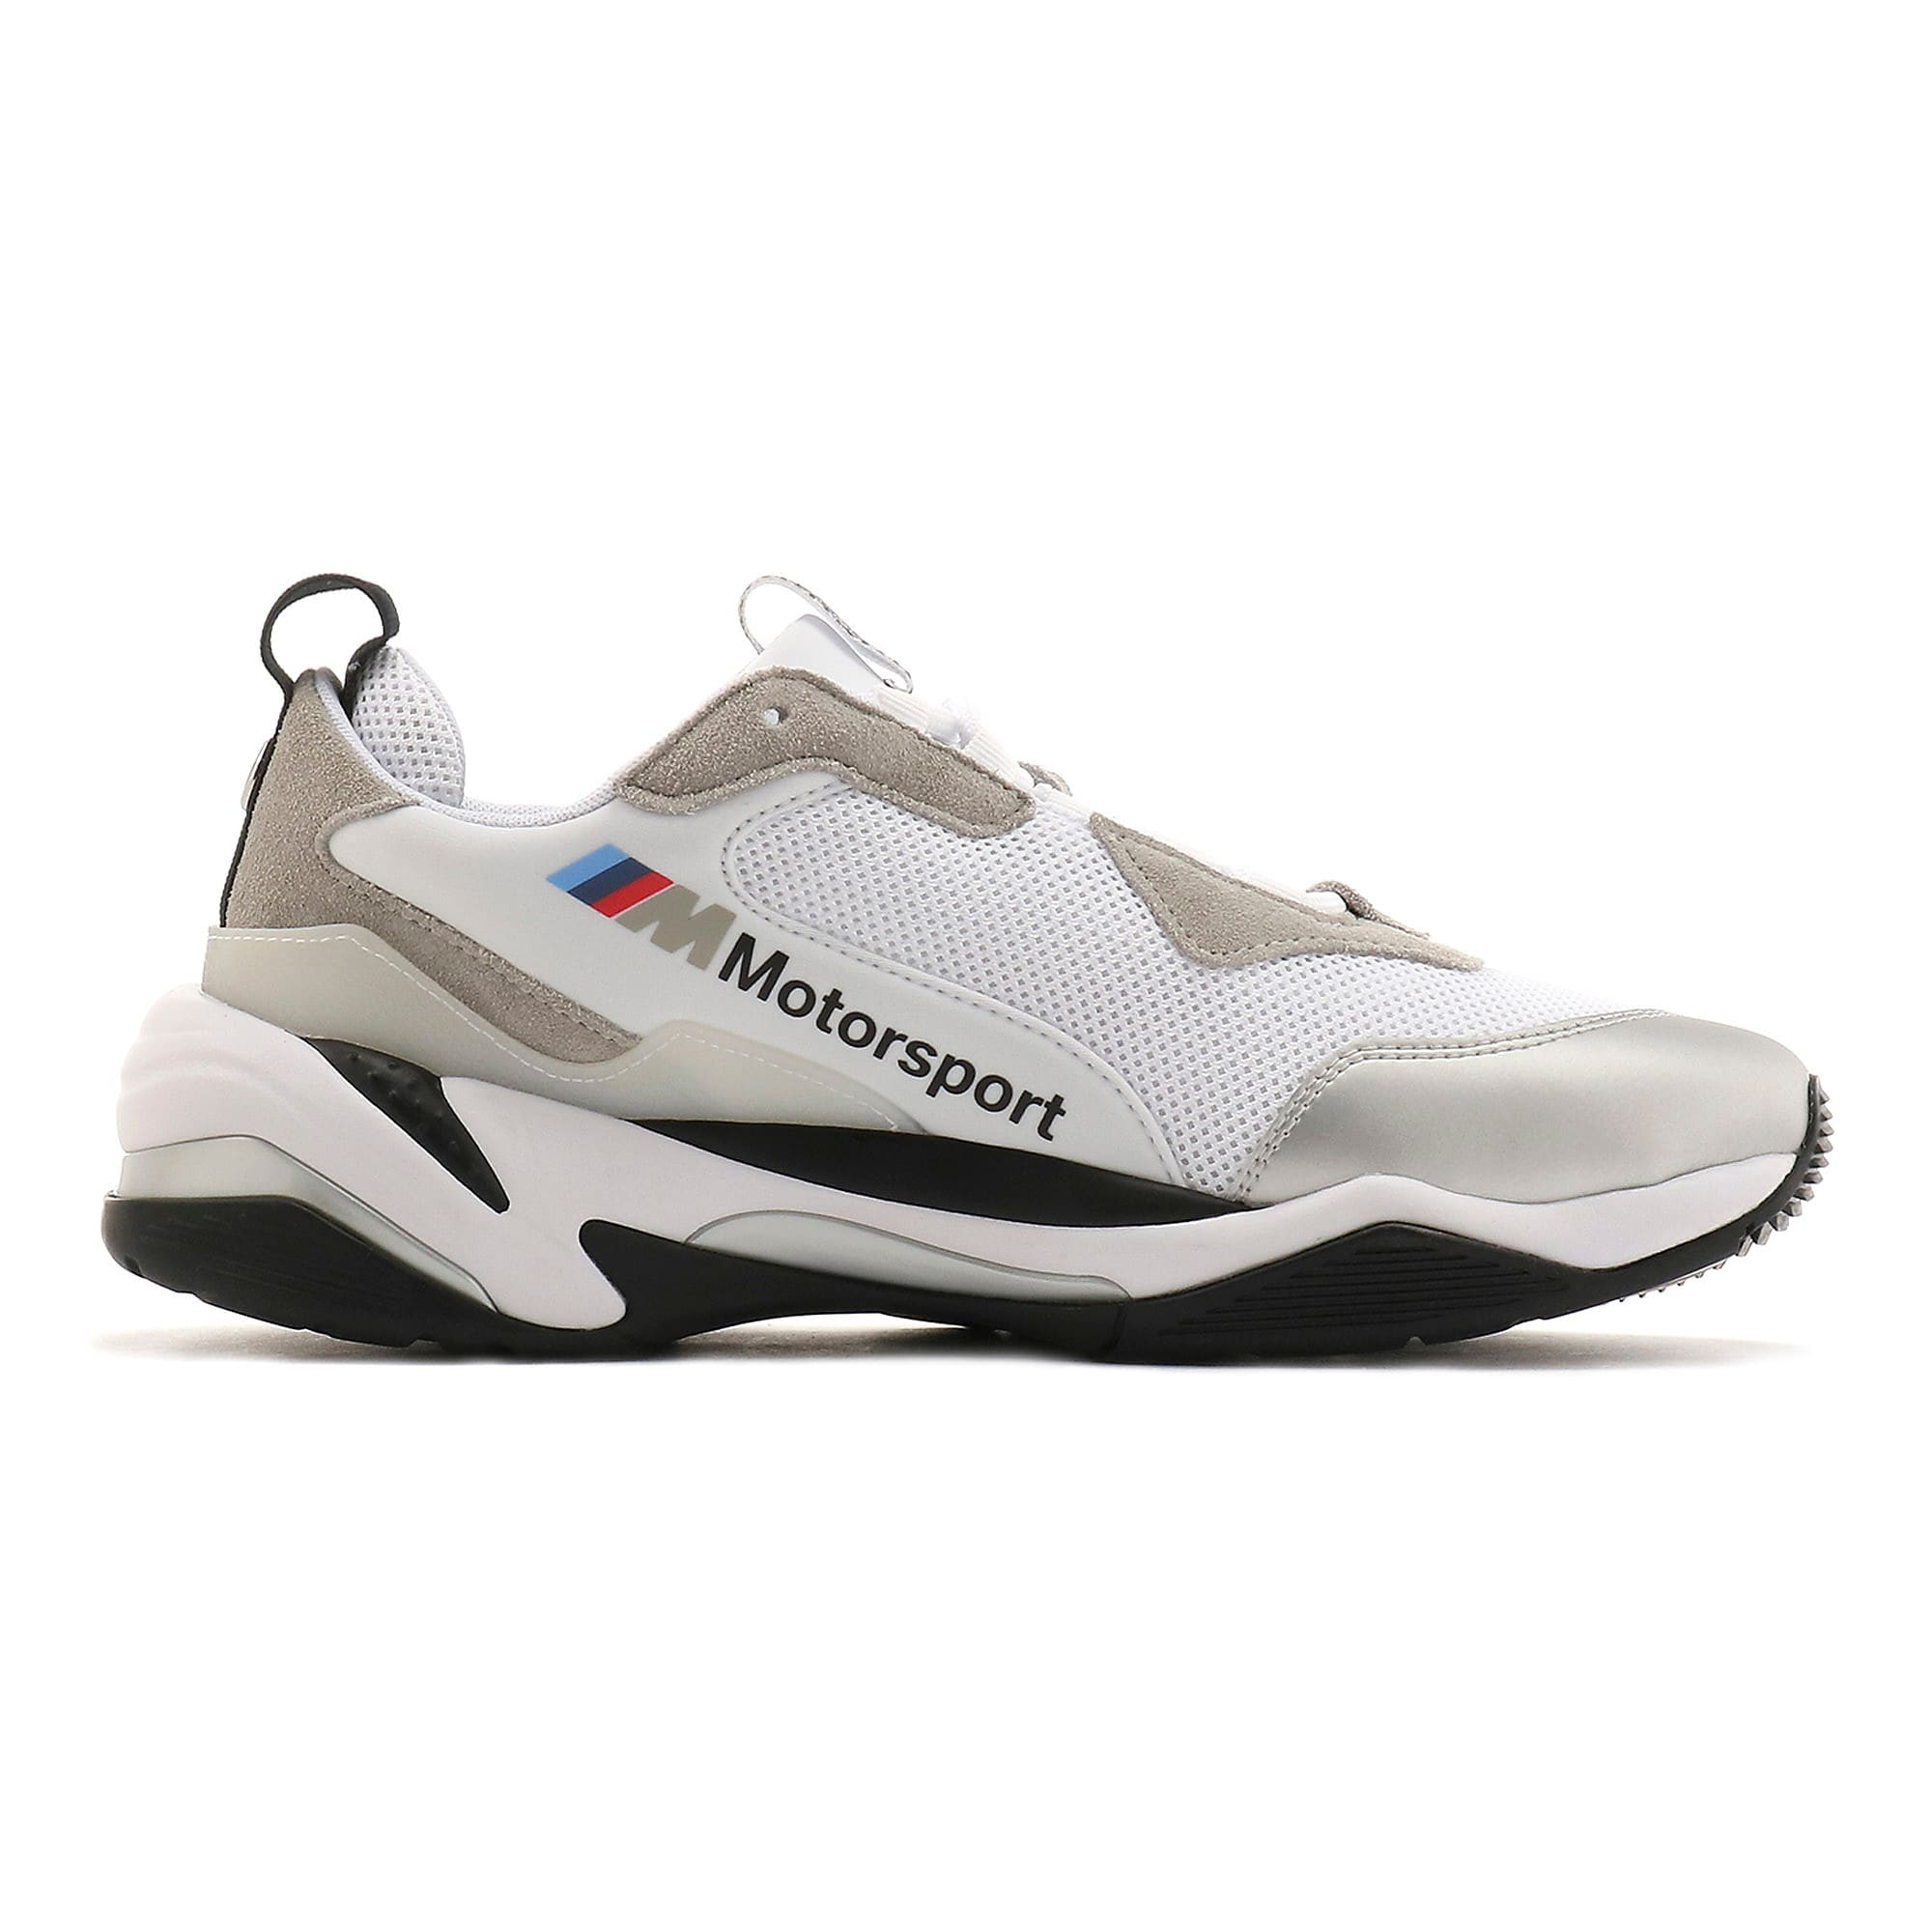 Thumbnail 5 of BMW MMS Thunder Sneakers, Puma White-Puma Silver, medium